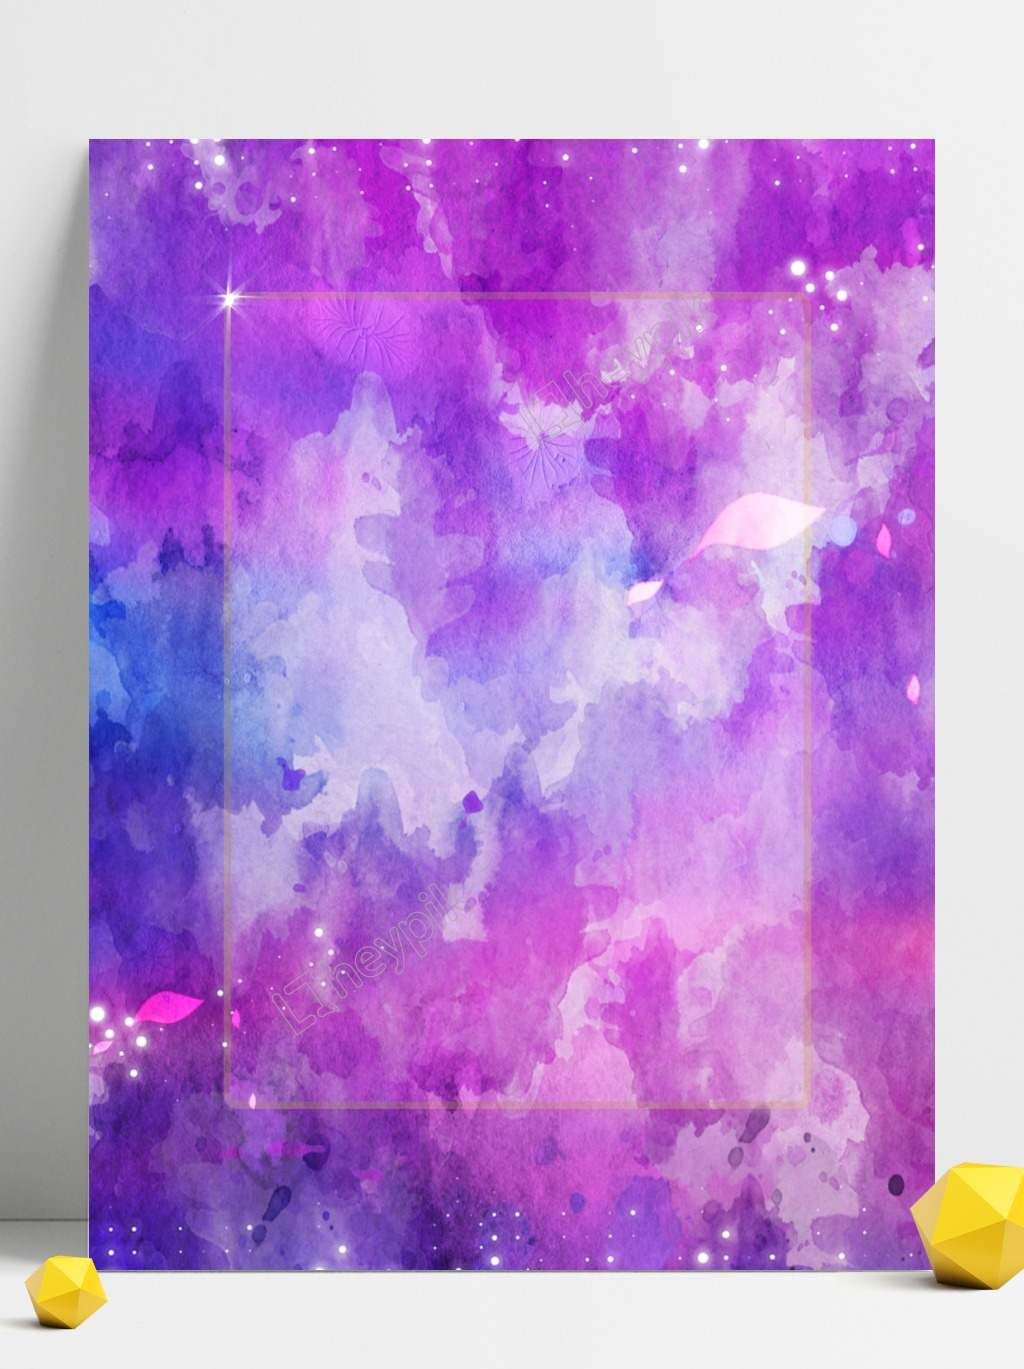 Textured Watercolor Purple Gradient Texture Beautiful Minimalist Dream Background Dream Background Texture Watercolor